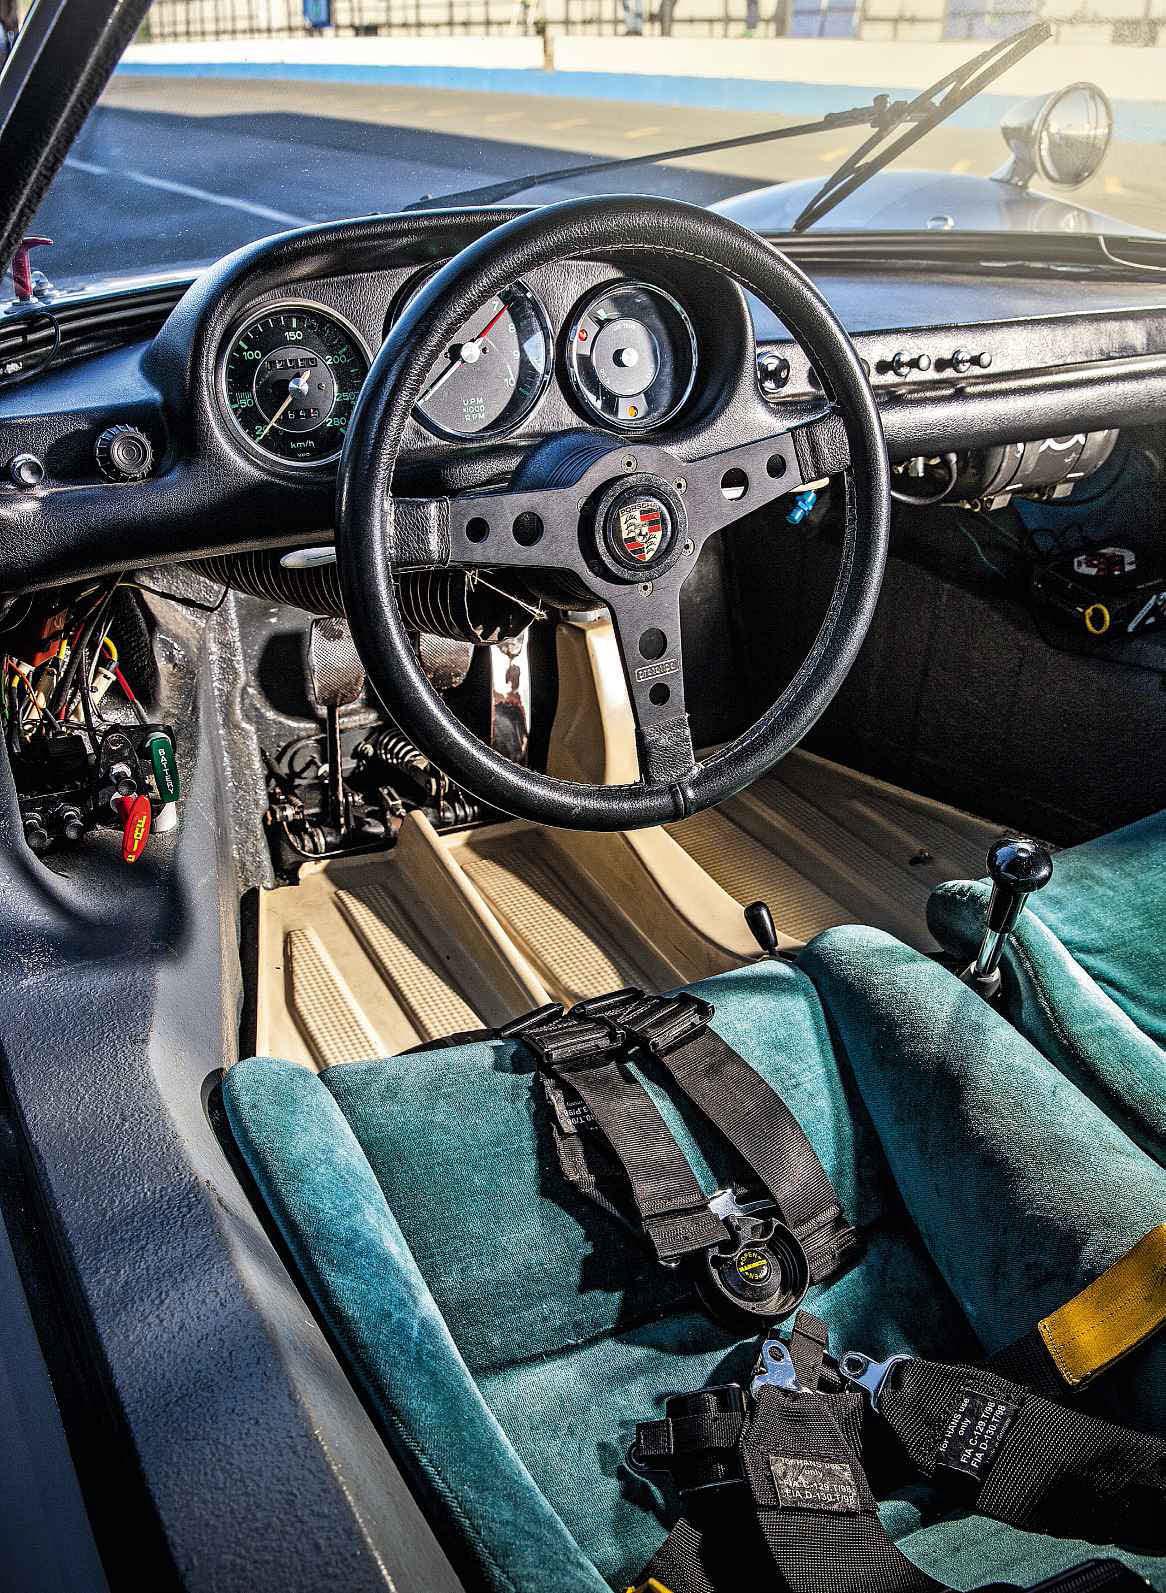 1965 Porsche Carrera GTS 904/6 driven